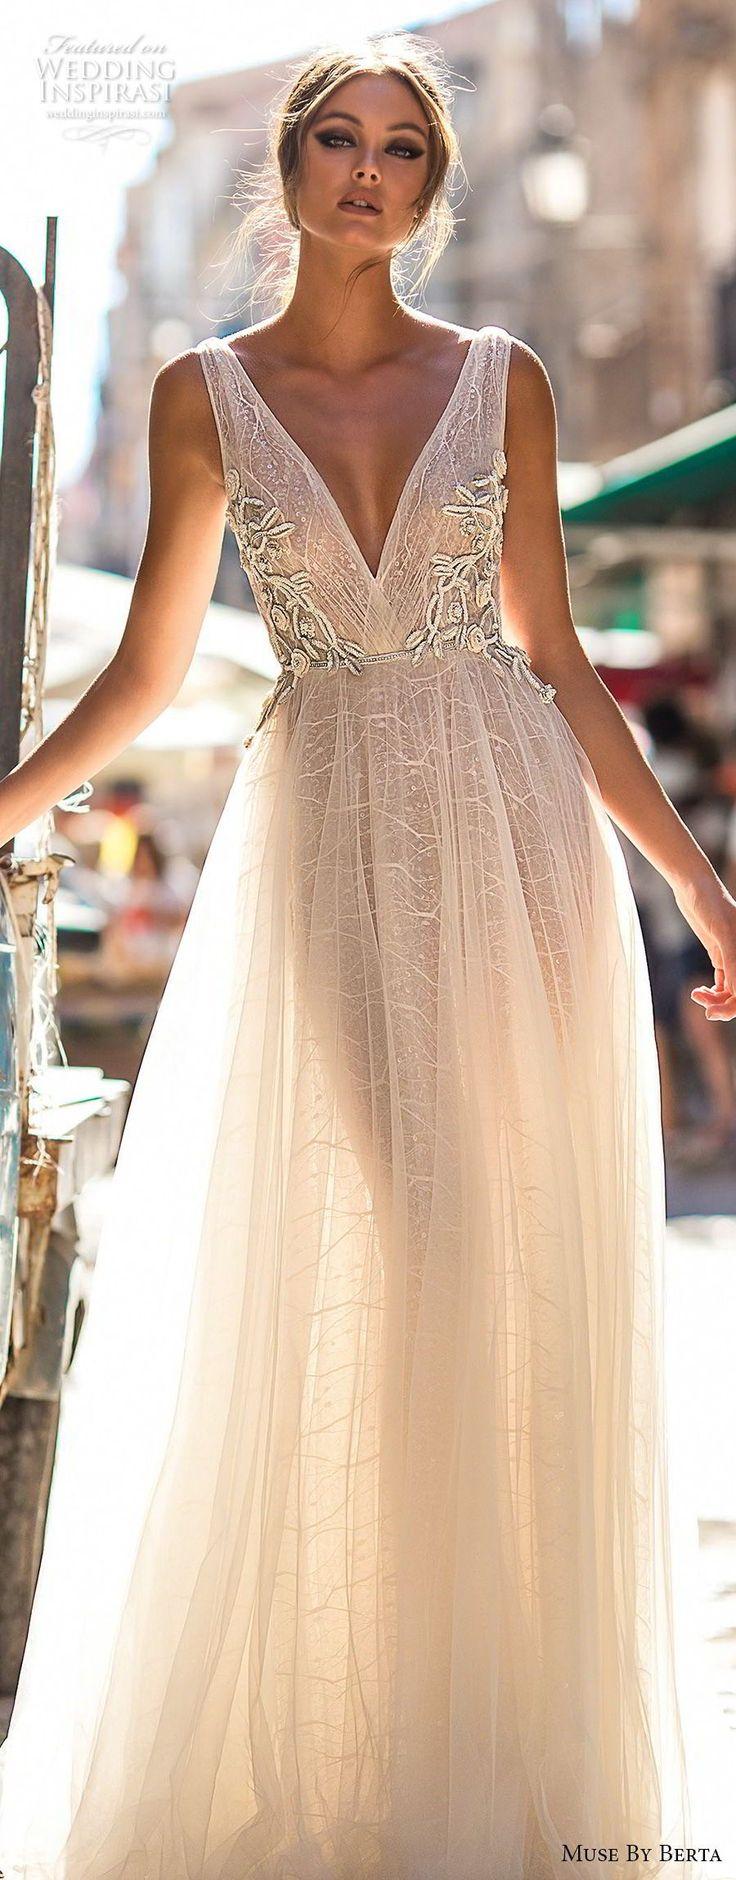 best abiti da sposa images on pinterest homecoming dresses